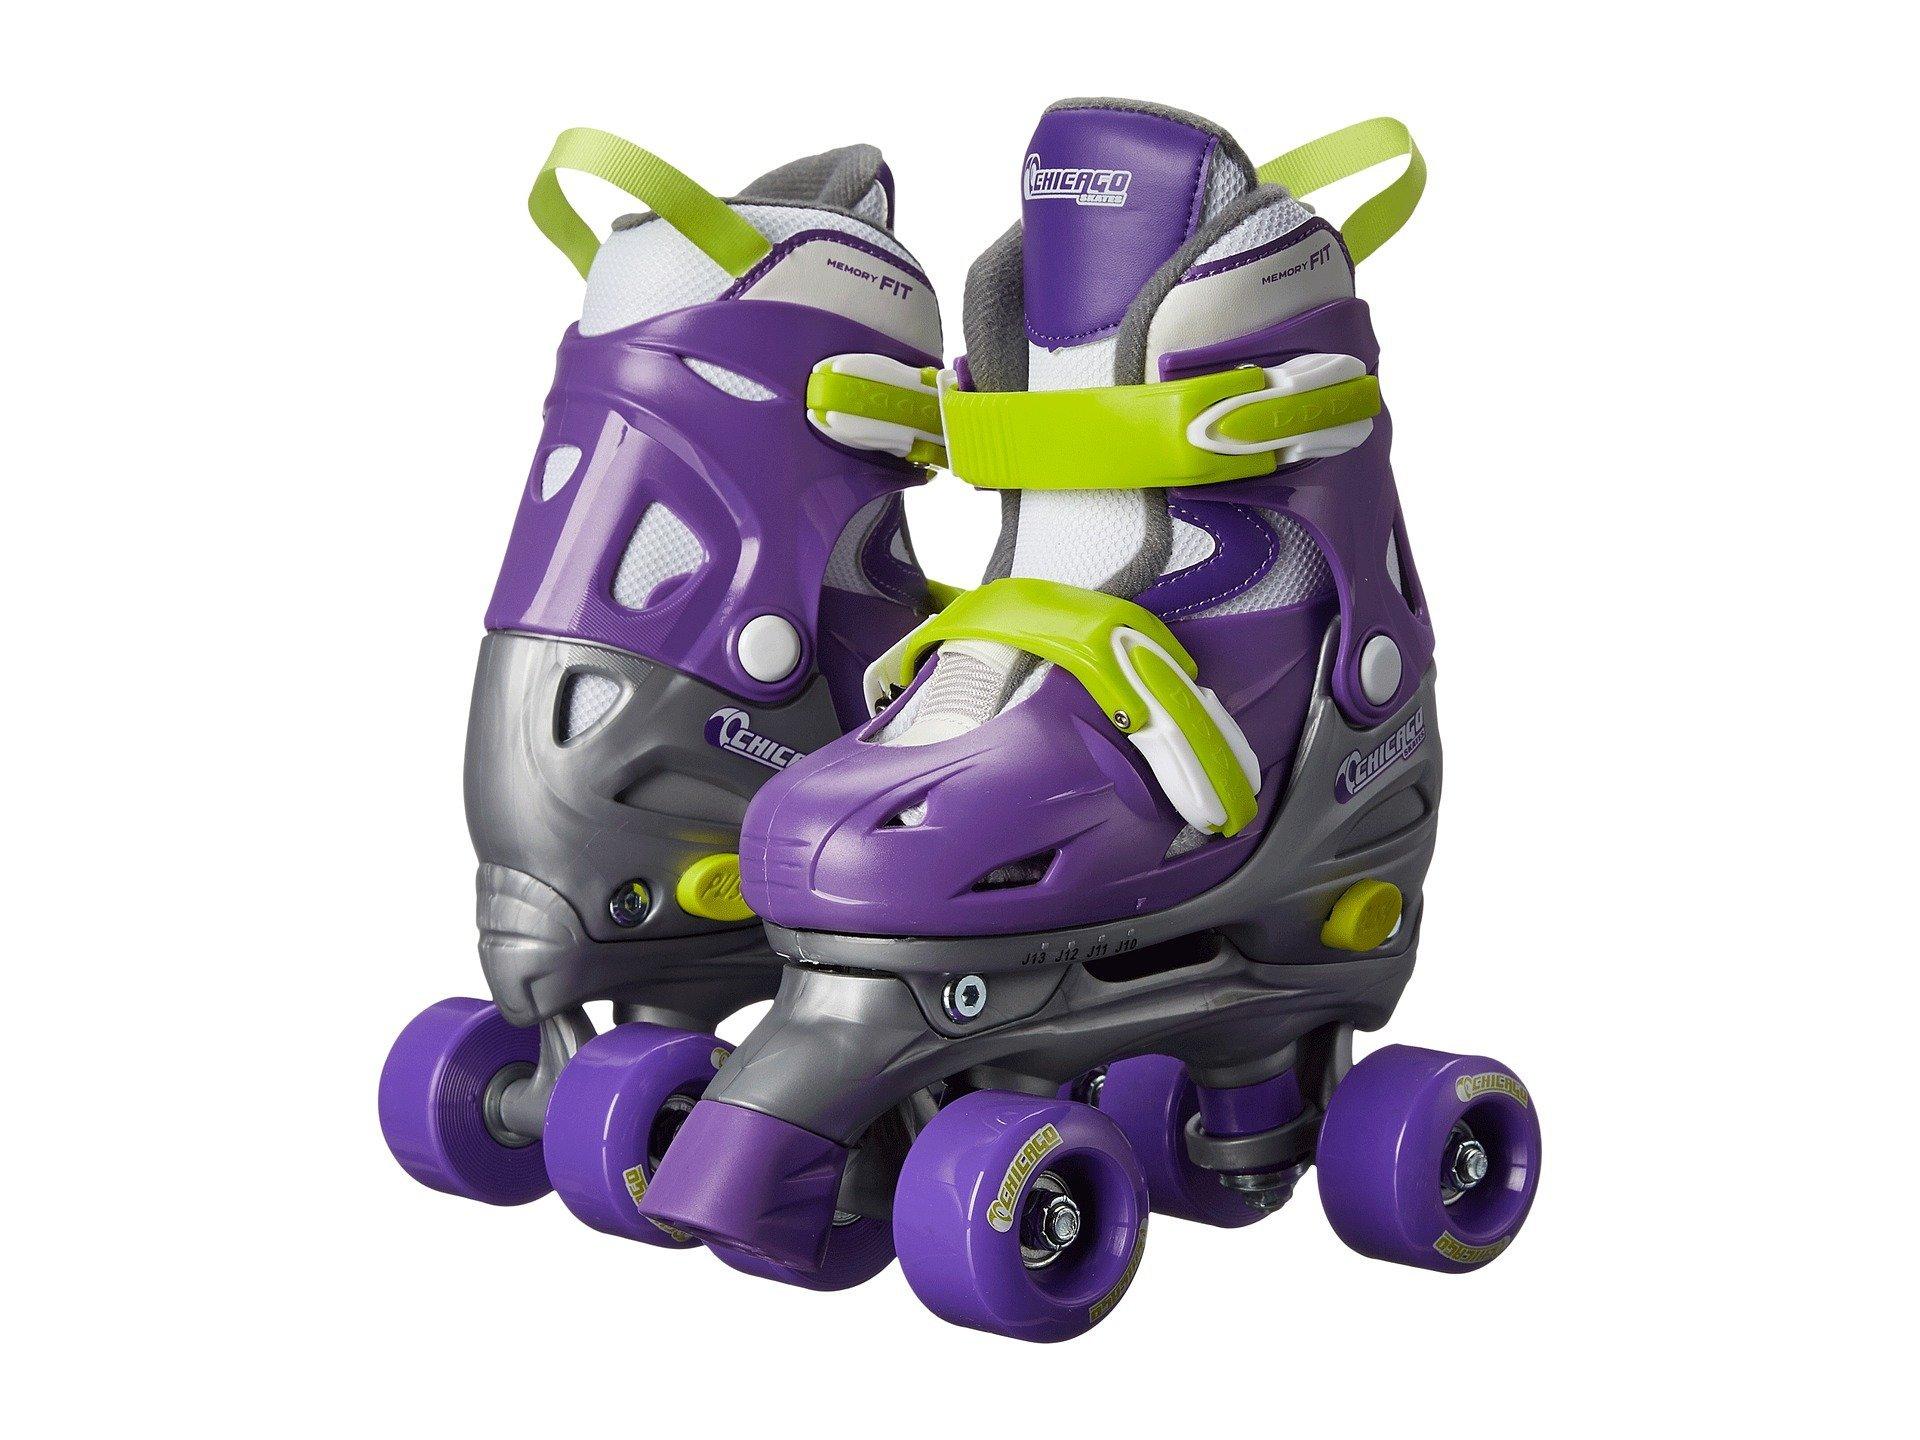 Chicago Kids Adjustable Quad Roller Skates - Purple - Small by Chicago Skates